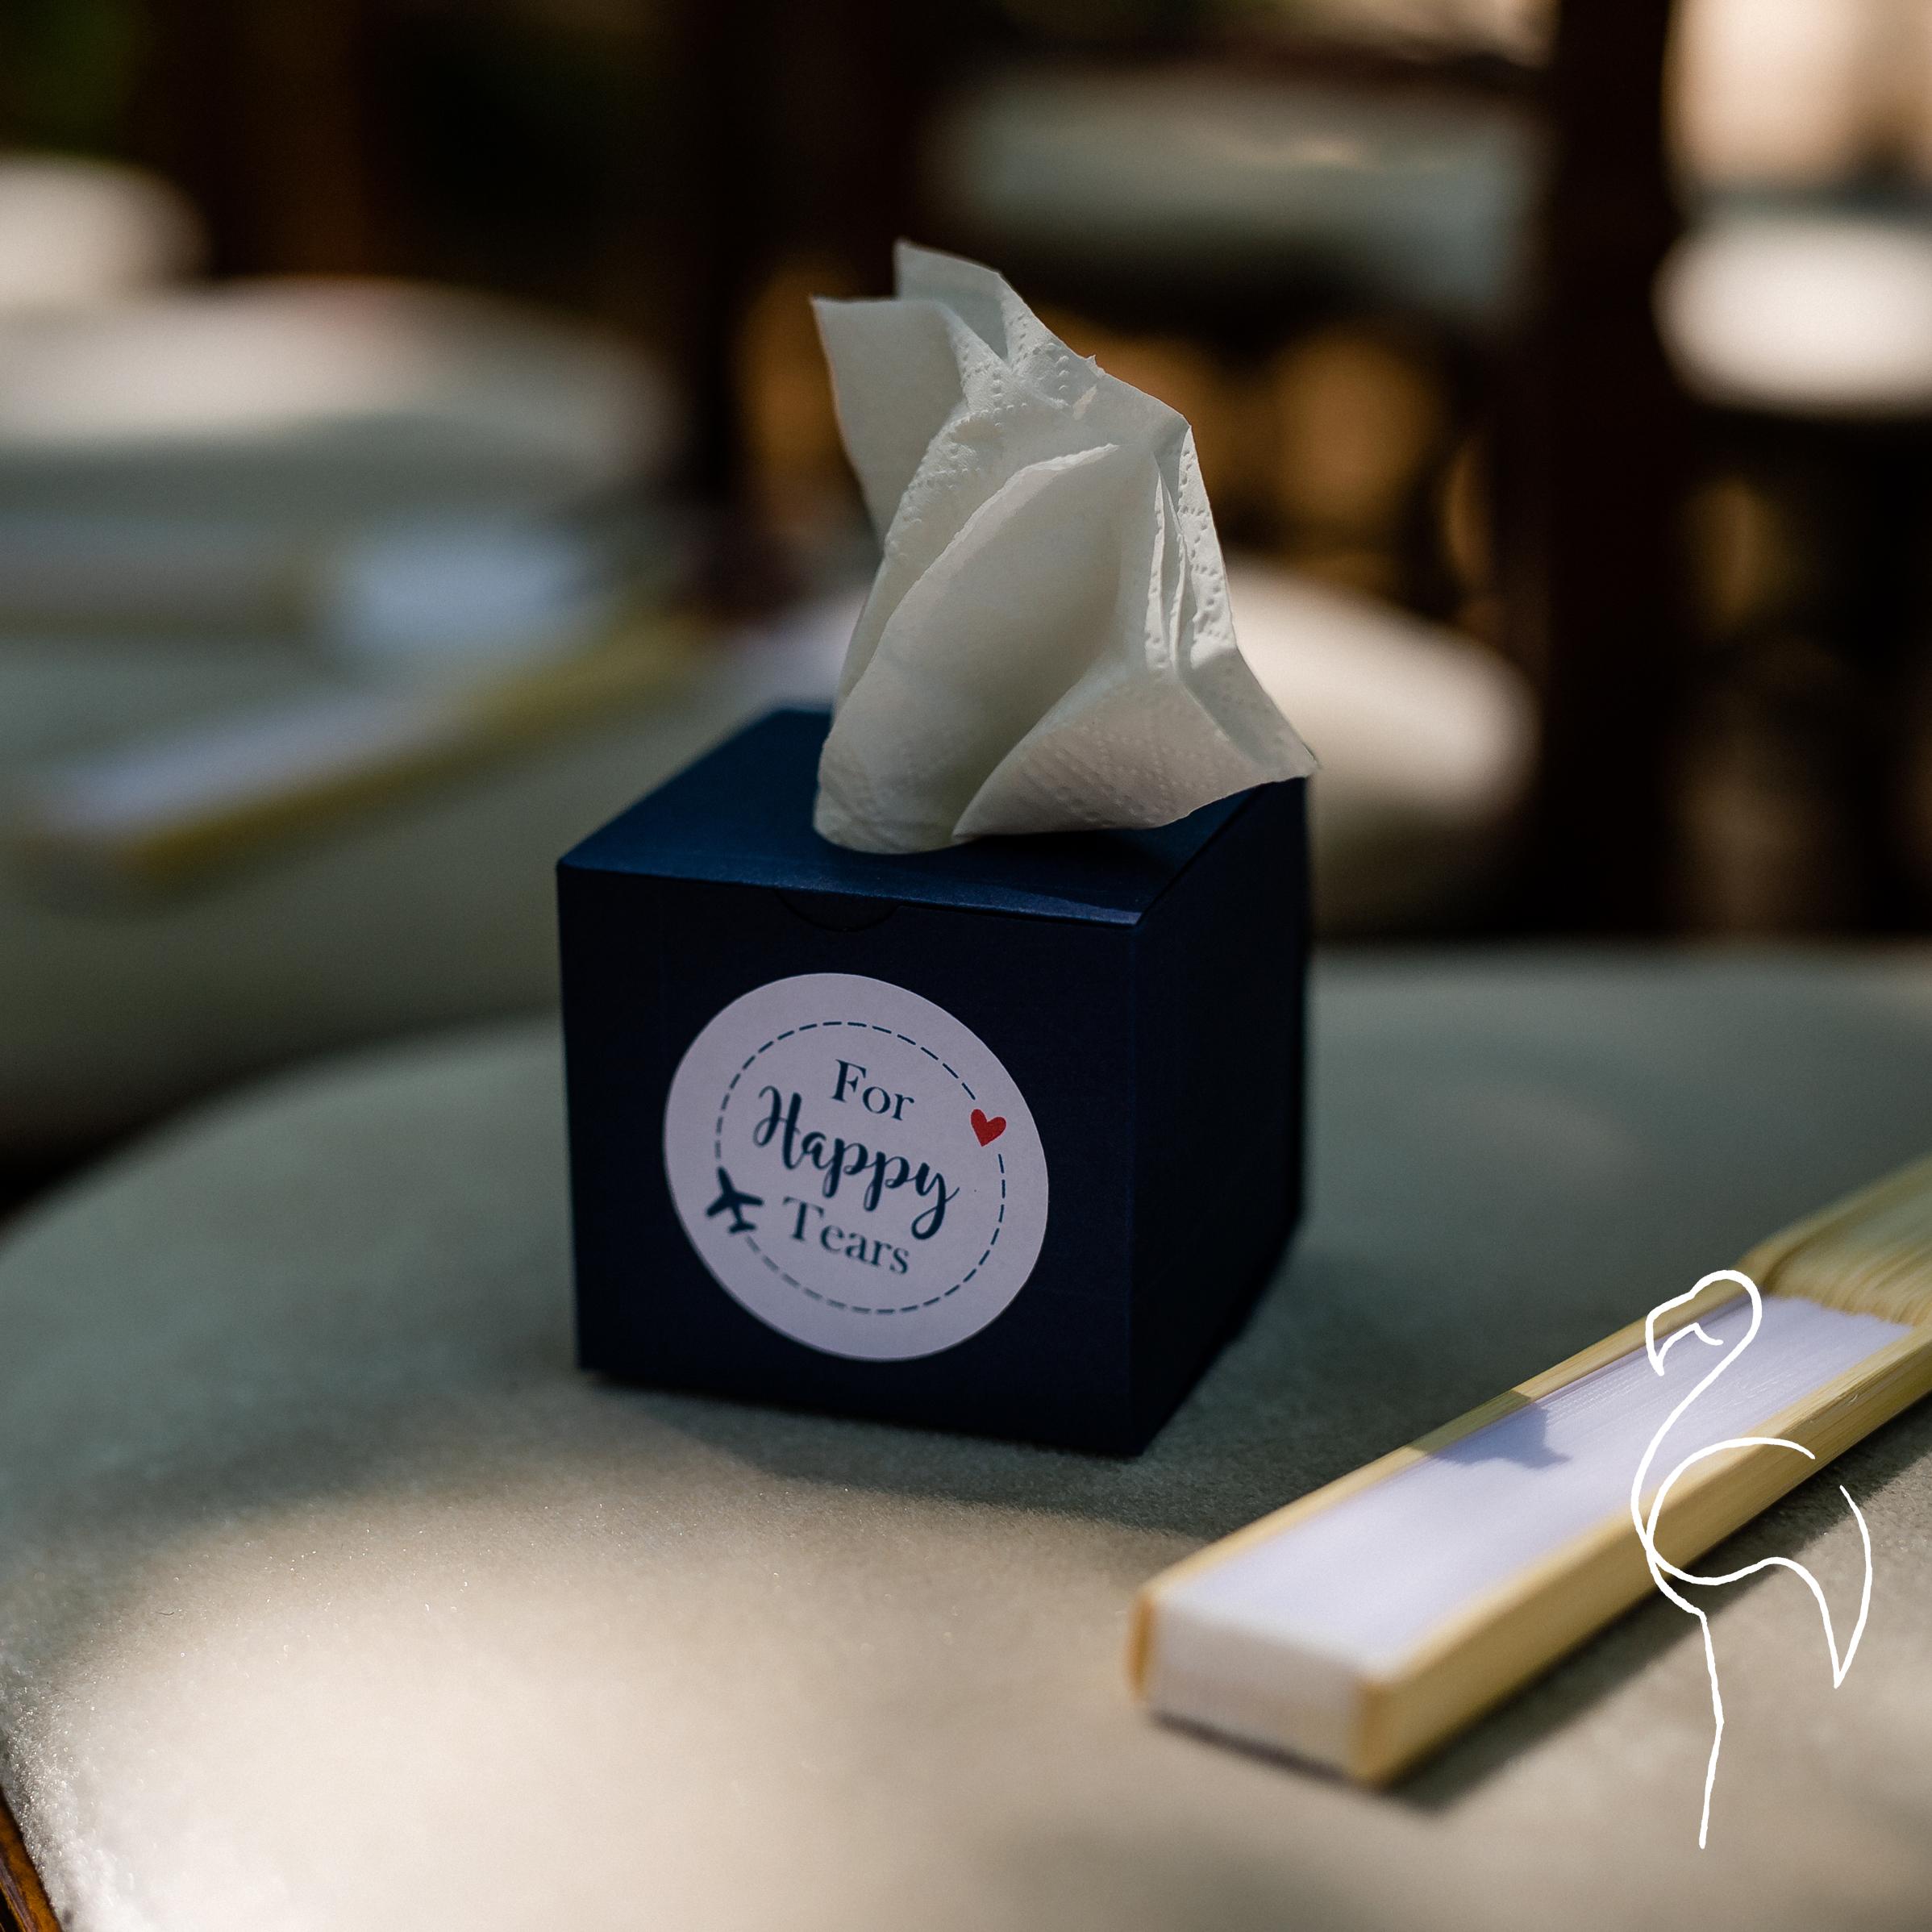 Brazzlebird - Custom Wedding Favors Tiny Tissue Boxes For Happy Tears.jpg